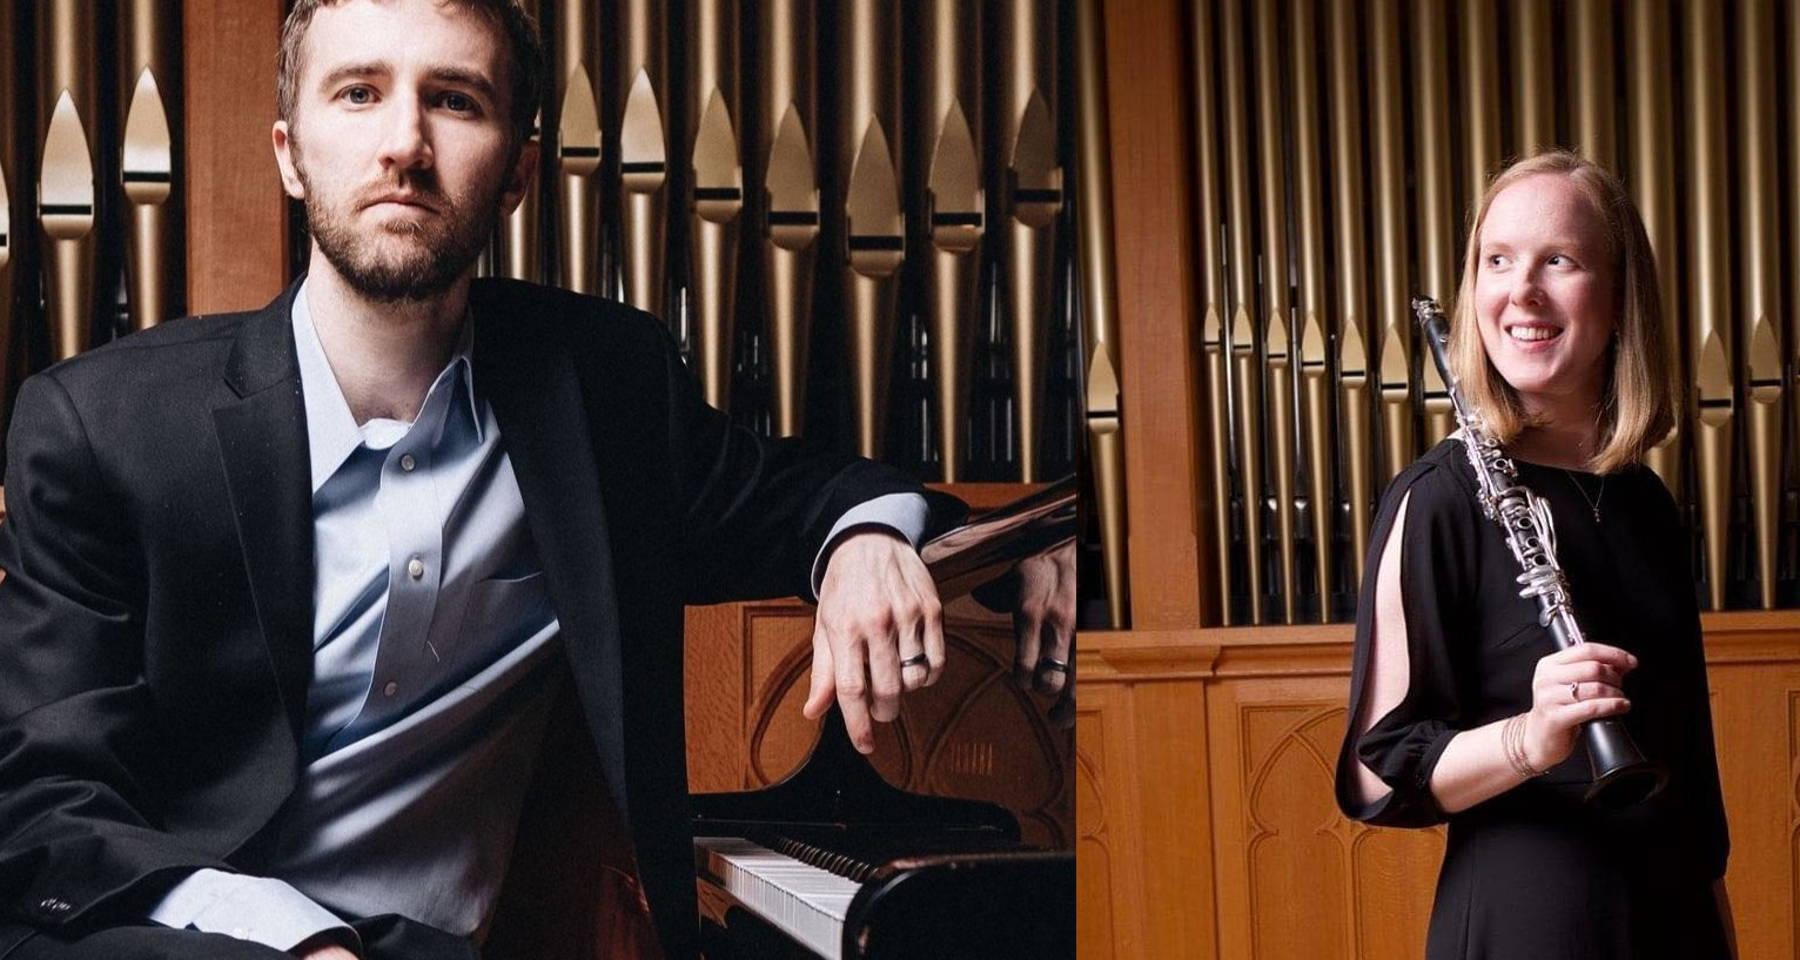 Clarinet & Piano with Sam Post & Lauren Geist